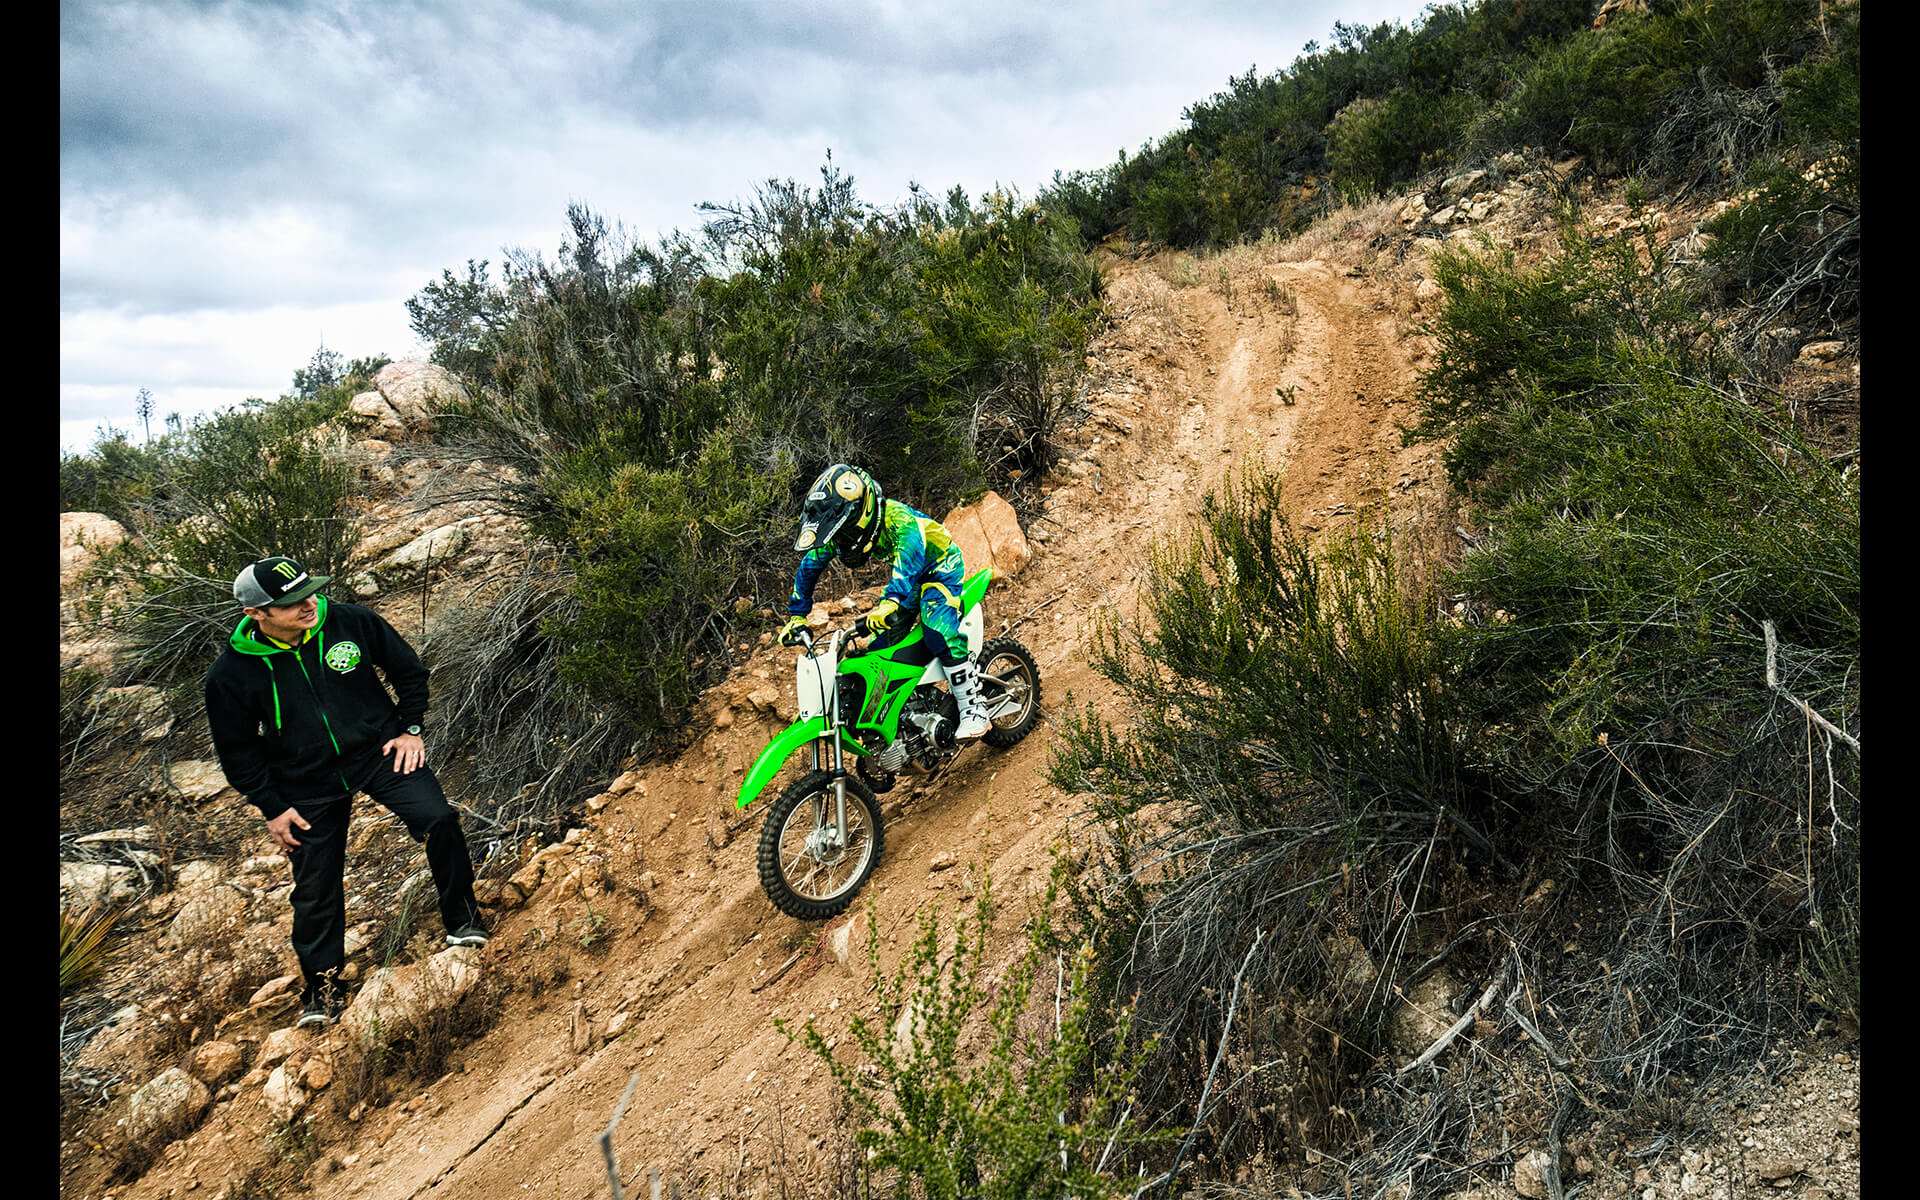 2020 Kawasaki KLX110 | Off-Road Motorcycle | Lightweight & Fun